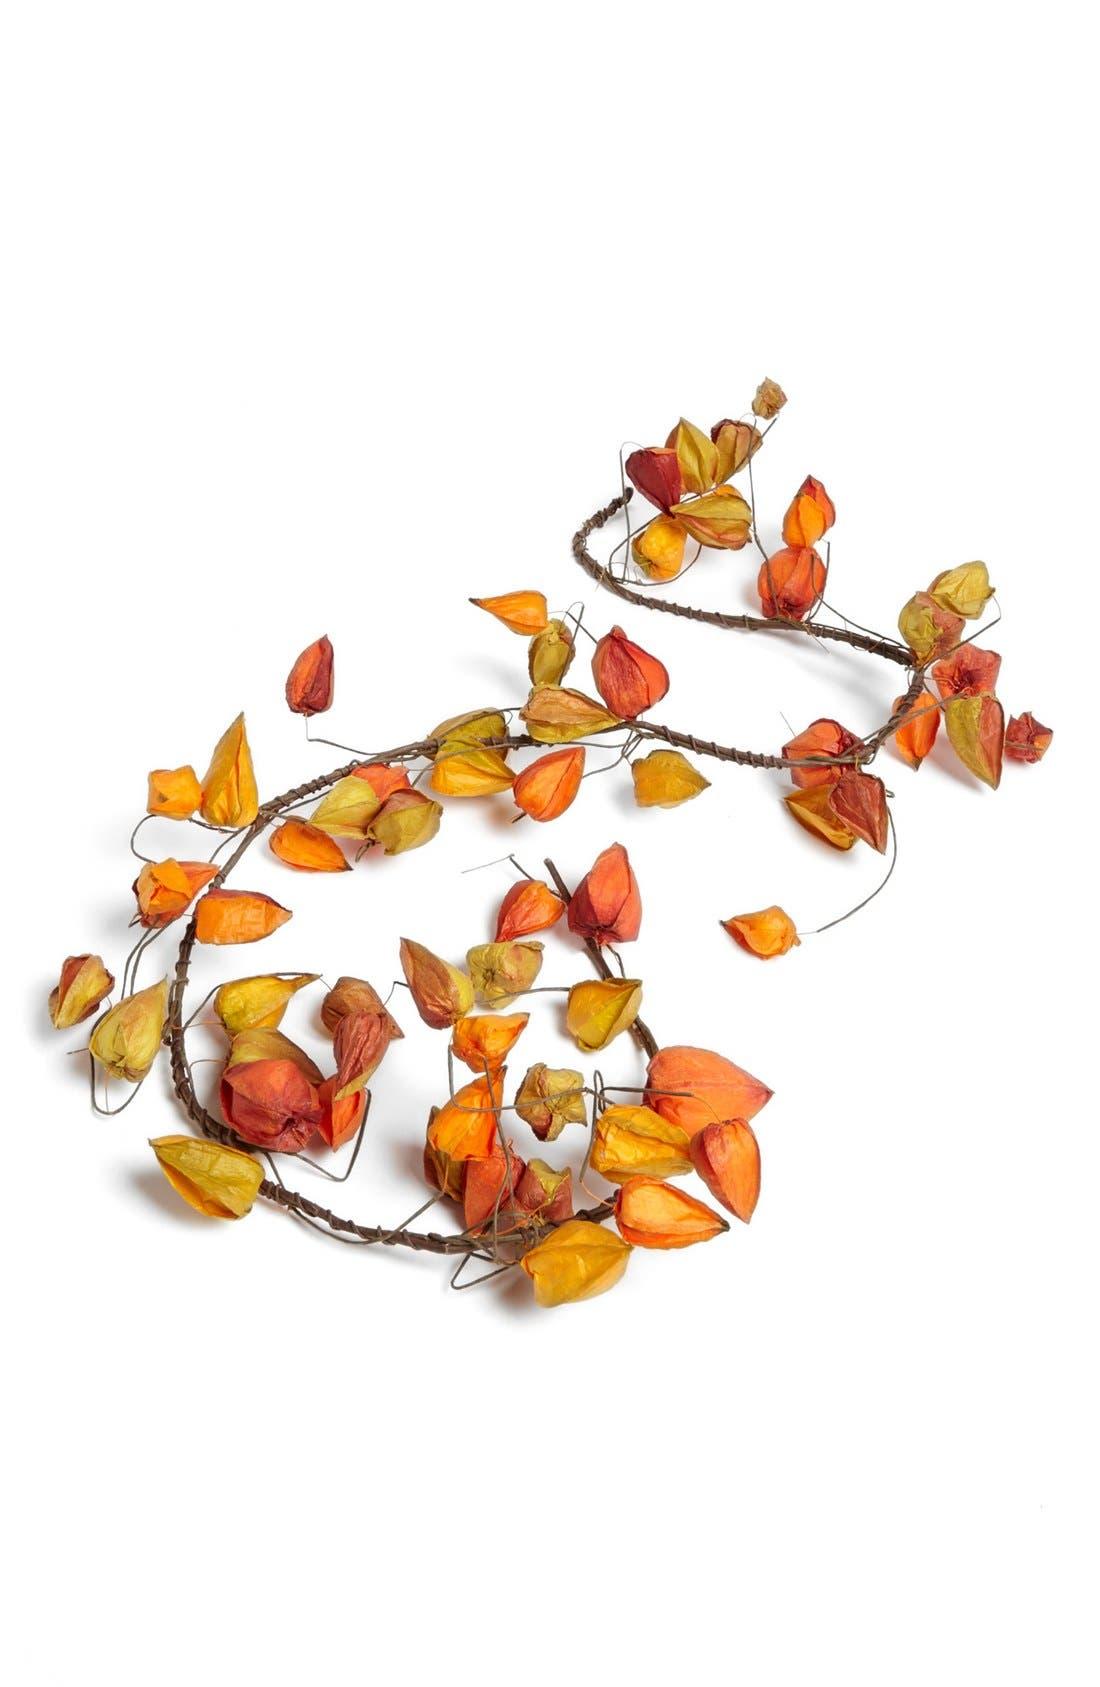 Alternate Image 1 Selected - Shea's Wildflower Japanese Lantern Garland